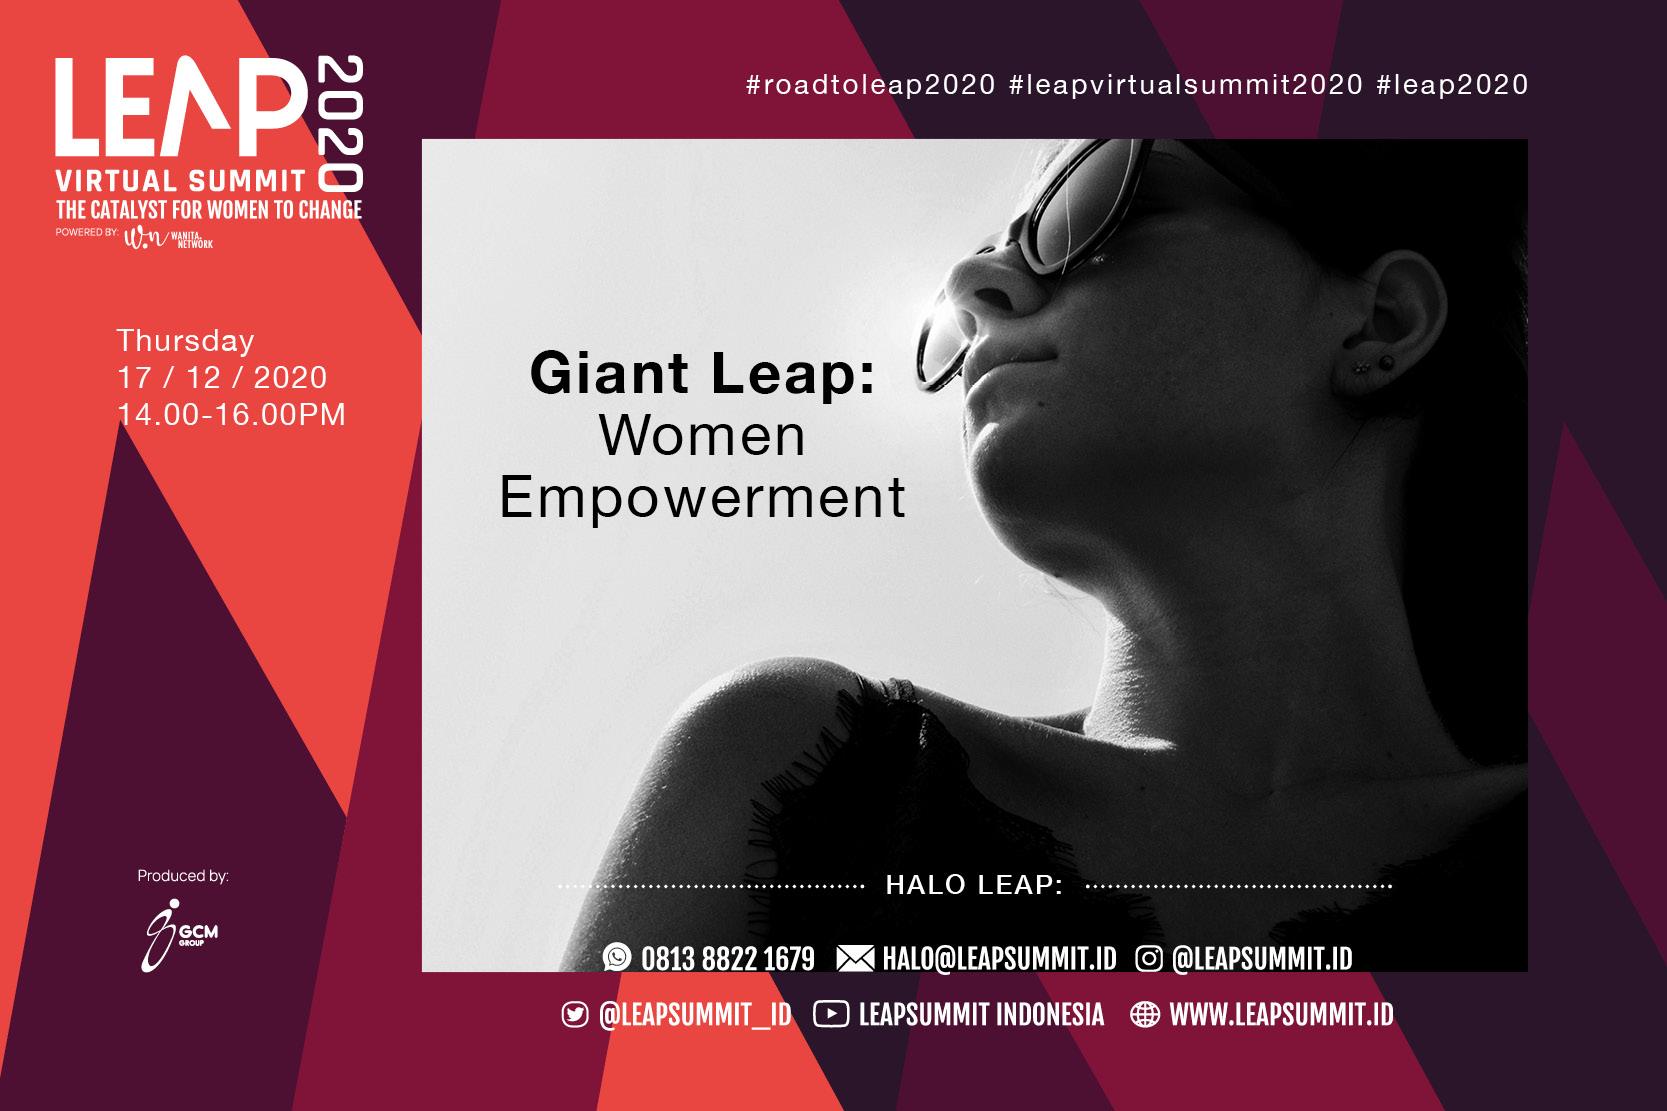 The Plenary: Giant Leap, Women Empowerment